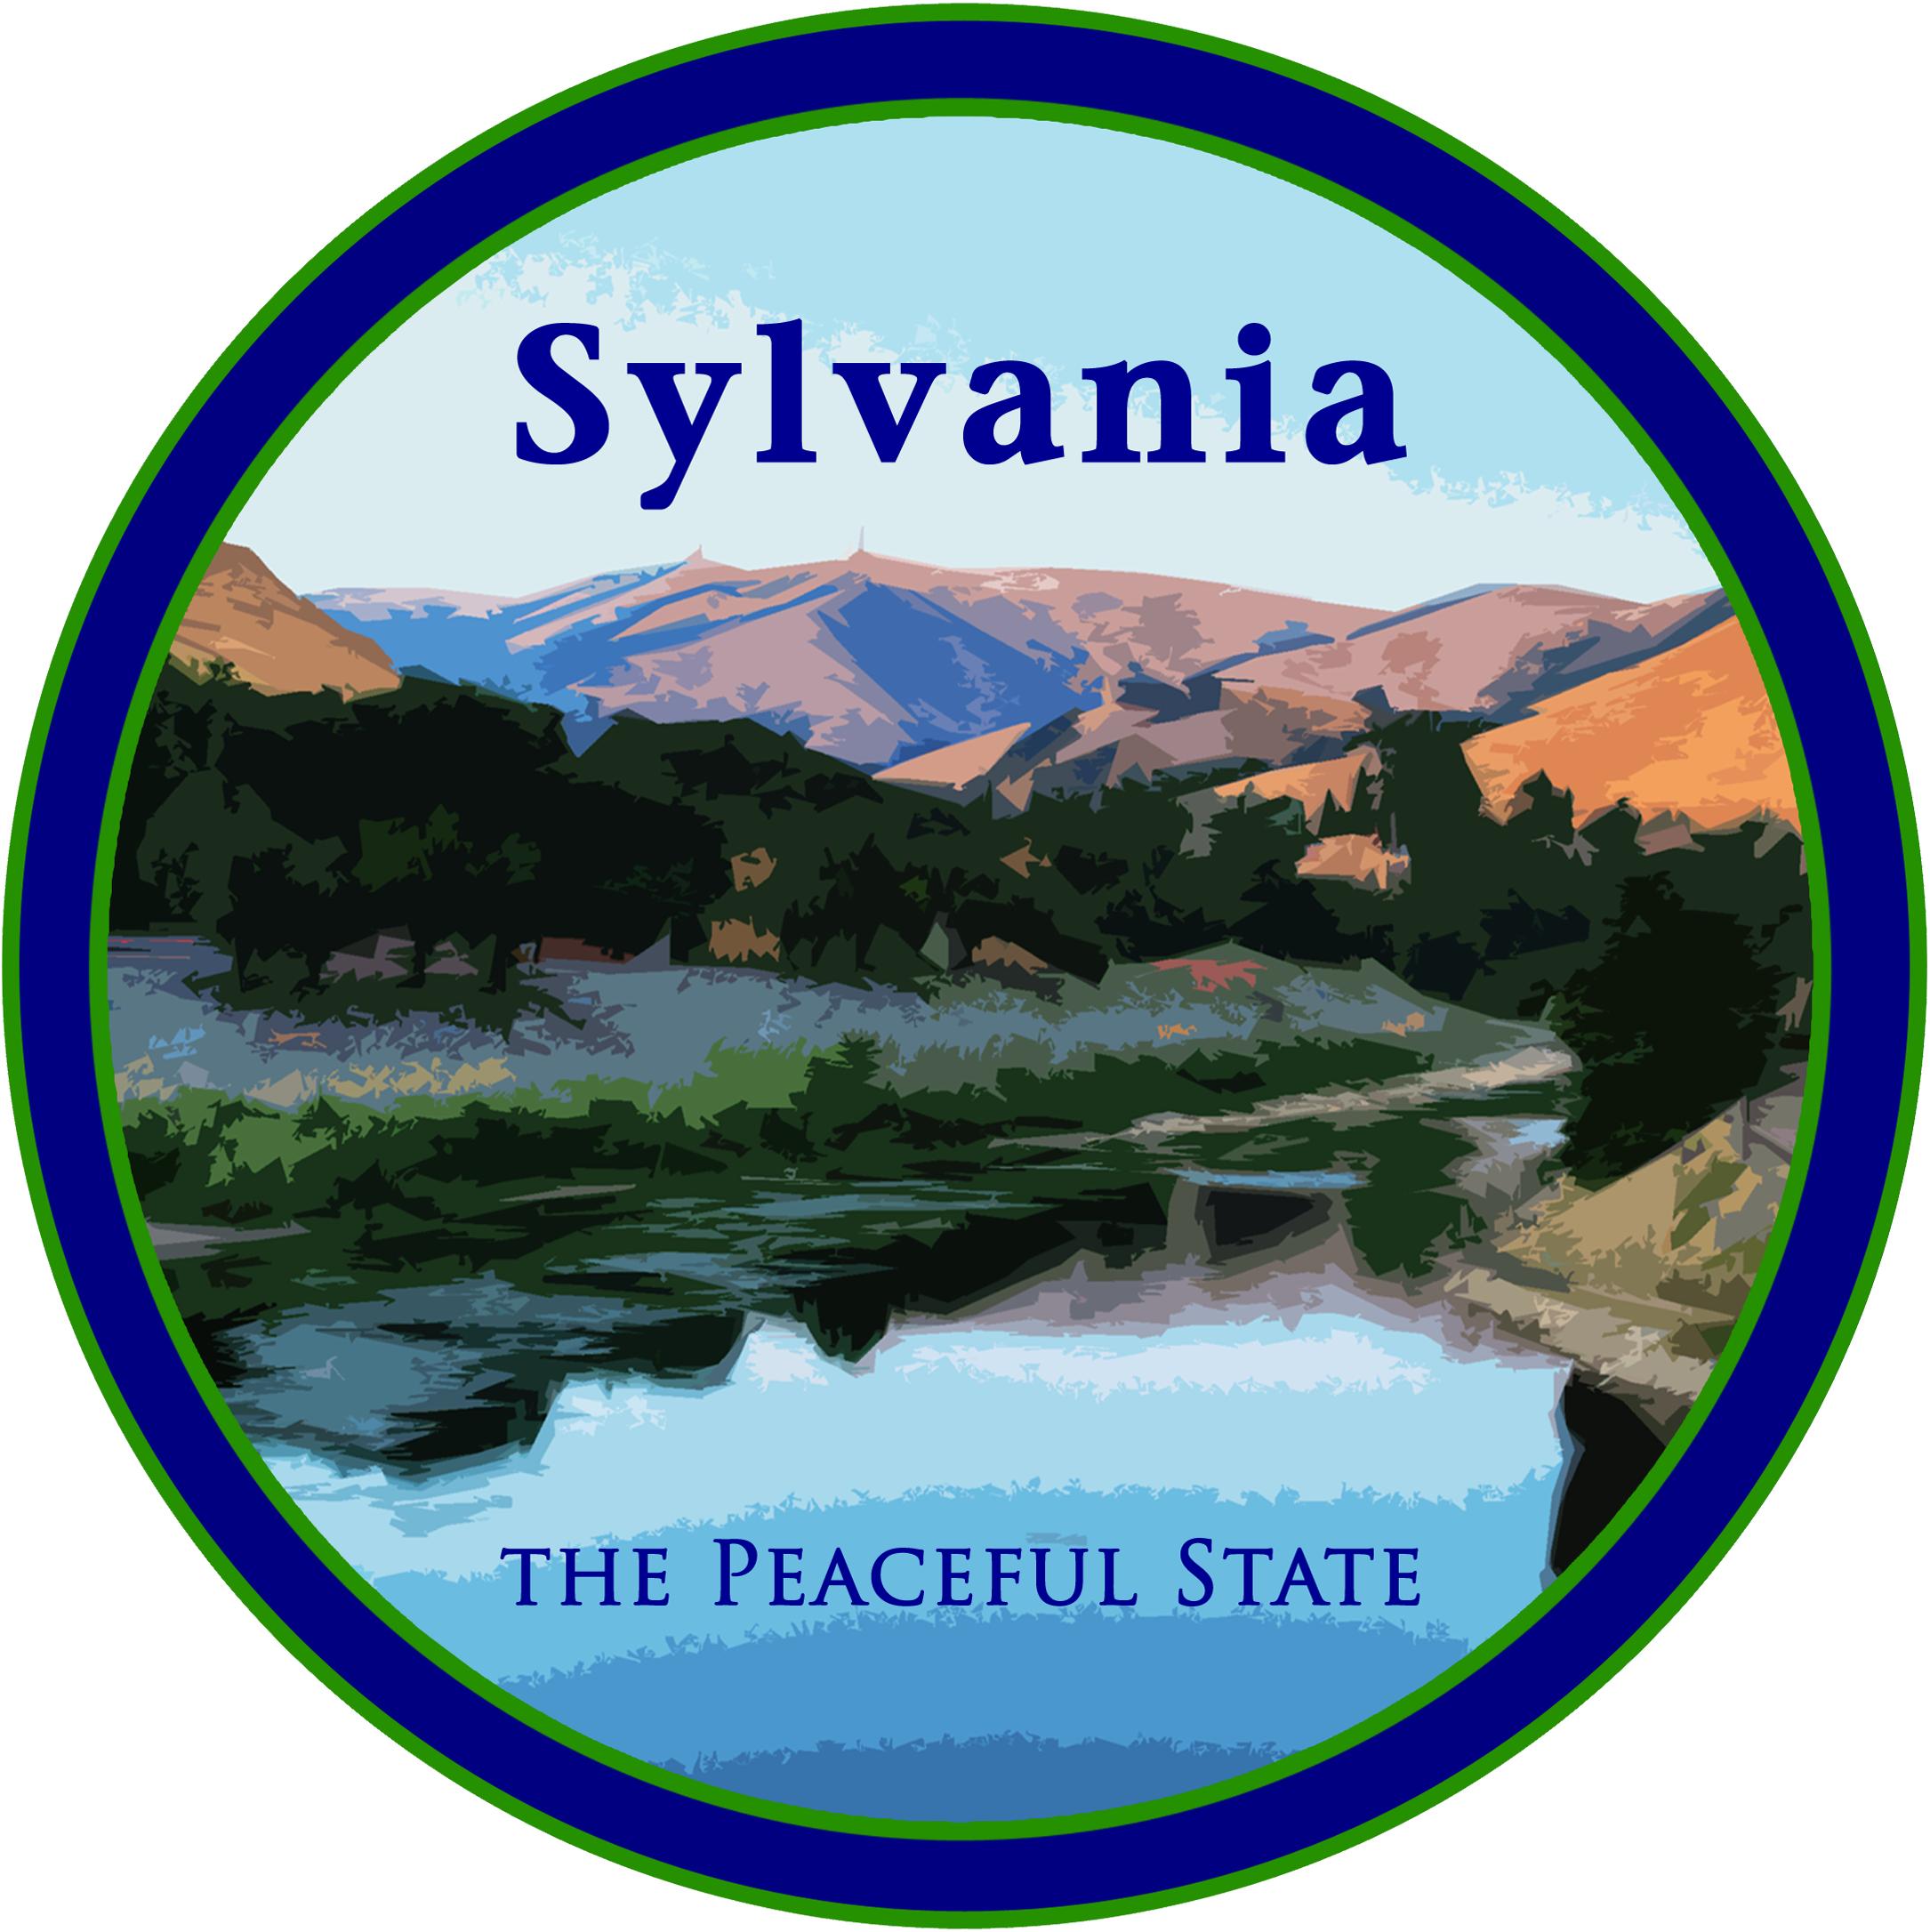 HQ Sylvania Wallpapers | File 1707.07Kb